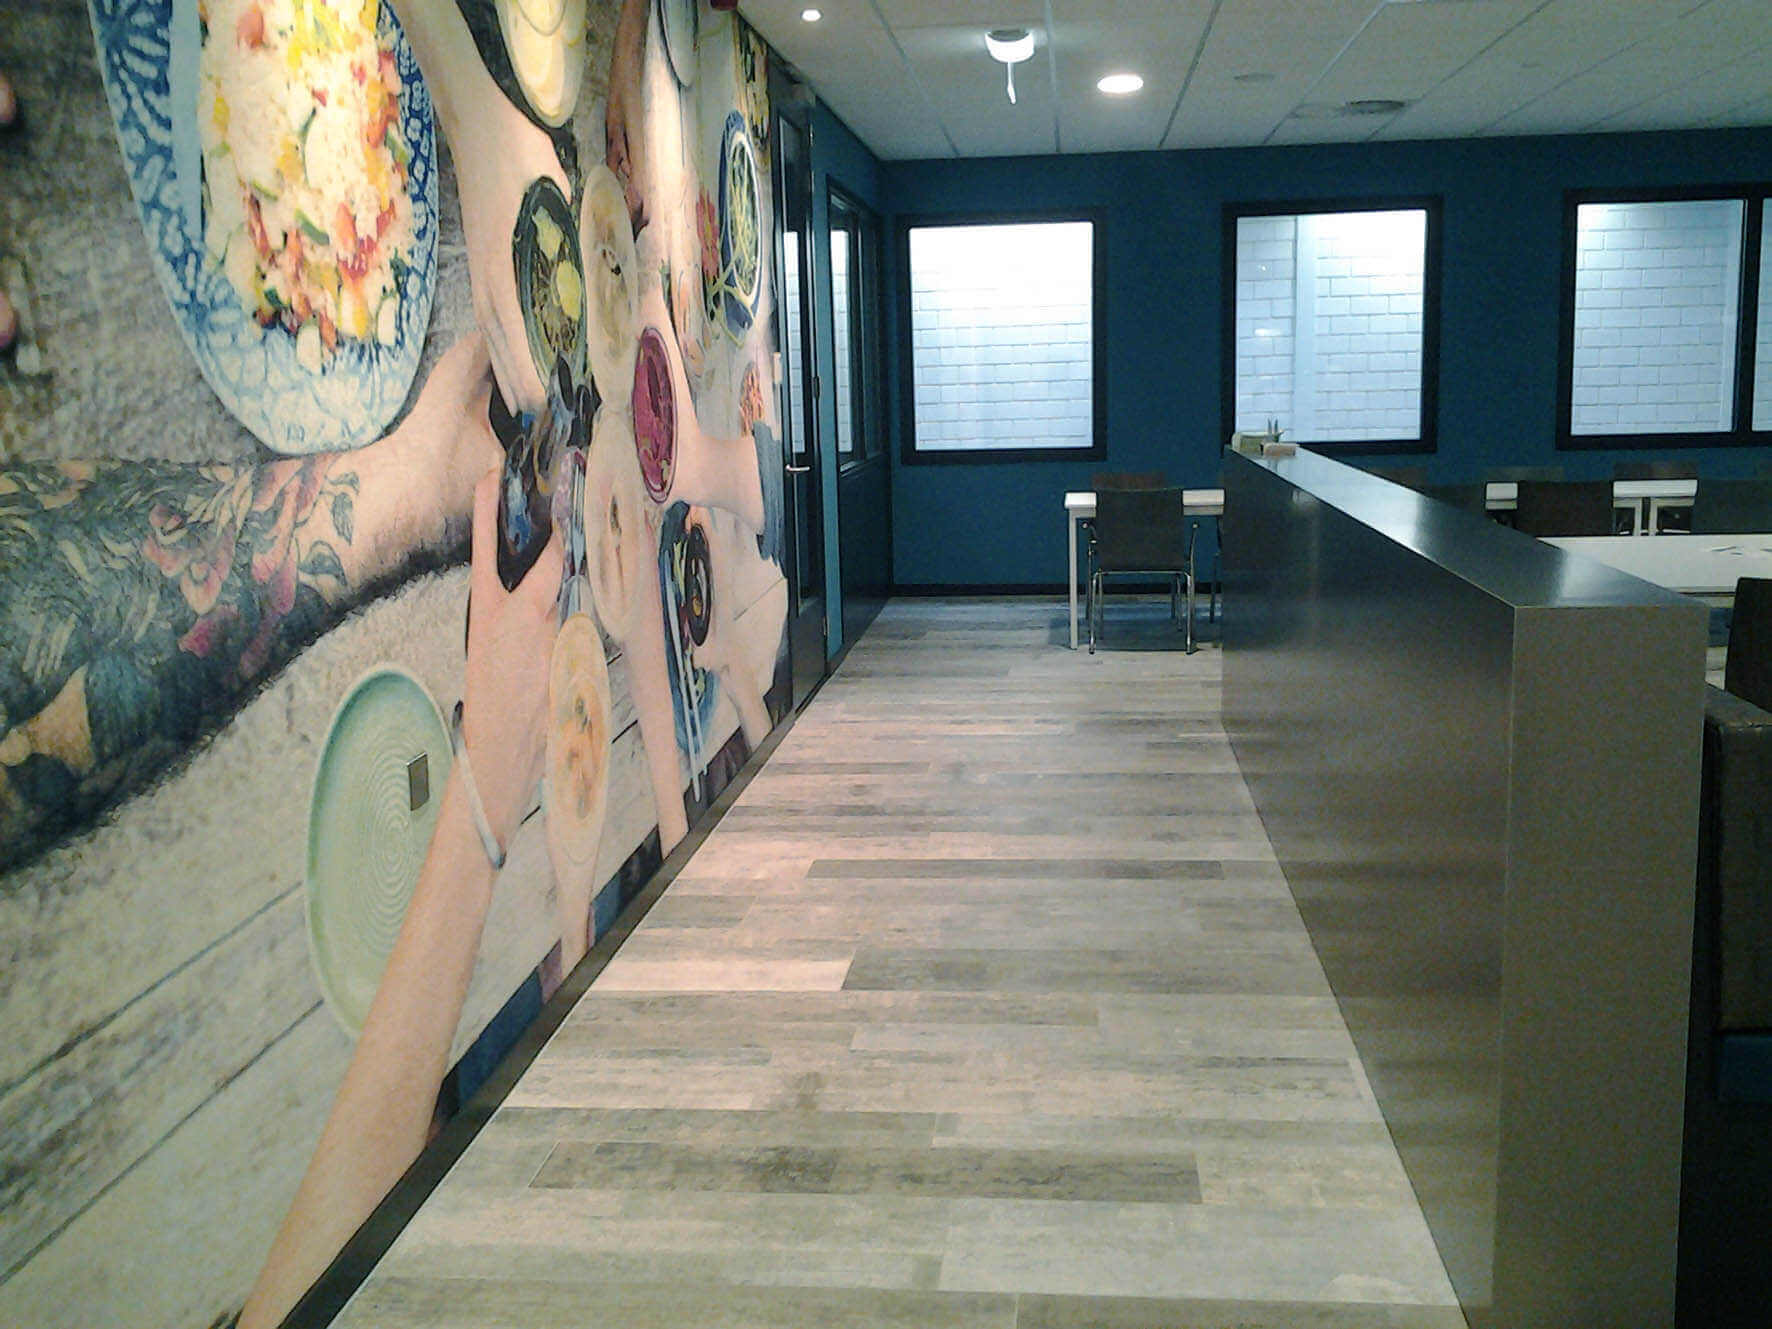 oficinas-cava-fino-grespania-3-baja